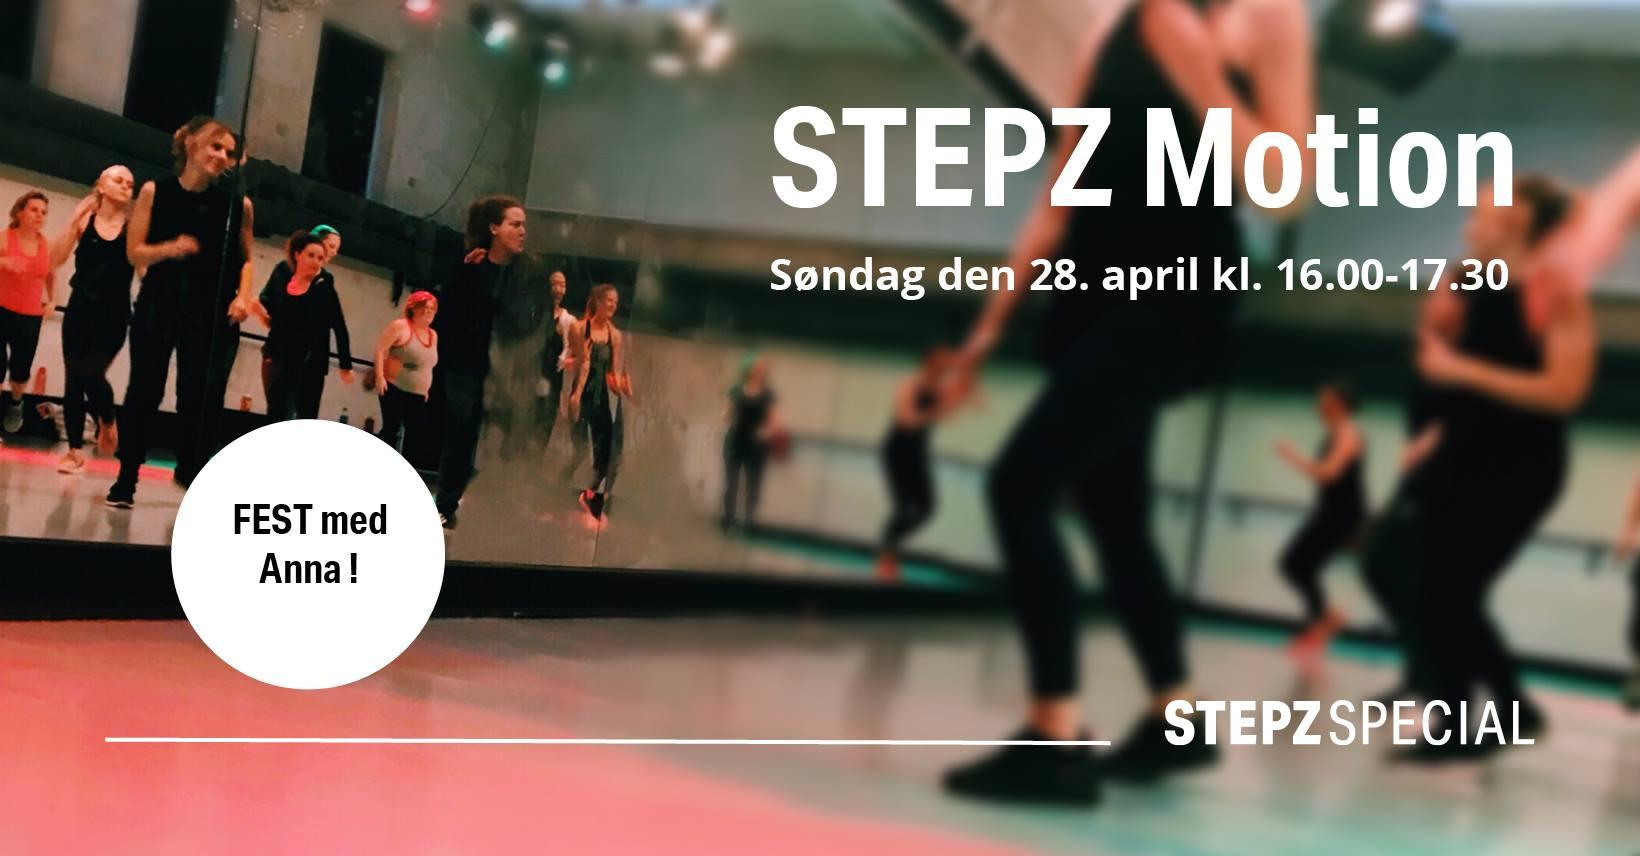 STEPZ Motion M. Anna 28/4